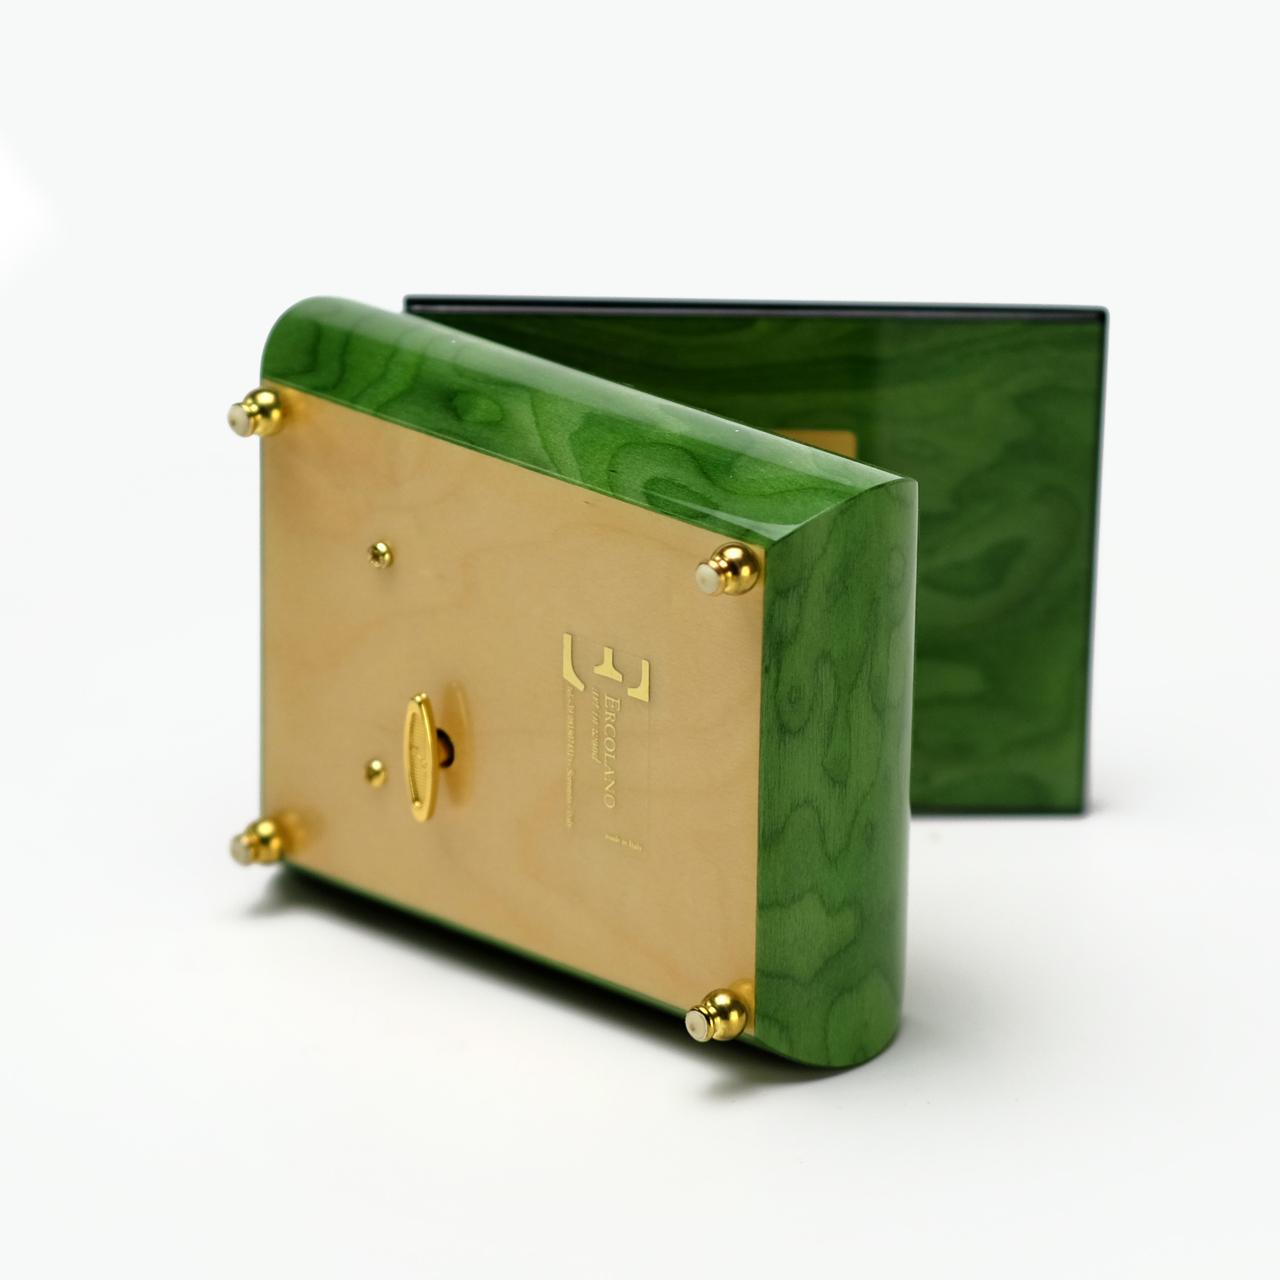 Handmade Ercolano 18 Note Music Box - Painting The Little Dragon Vase by Brenda Burke